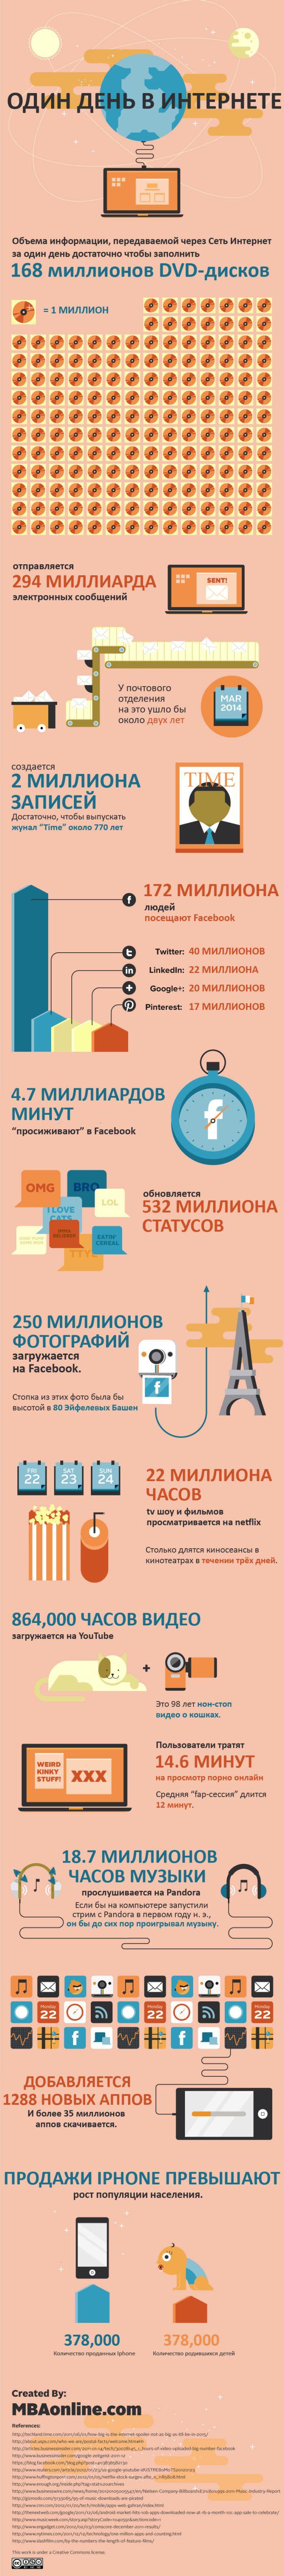 http://trinixy.ru/pics5/20120312/inet_01.jpg